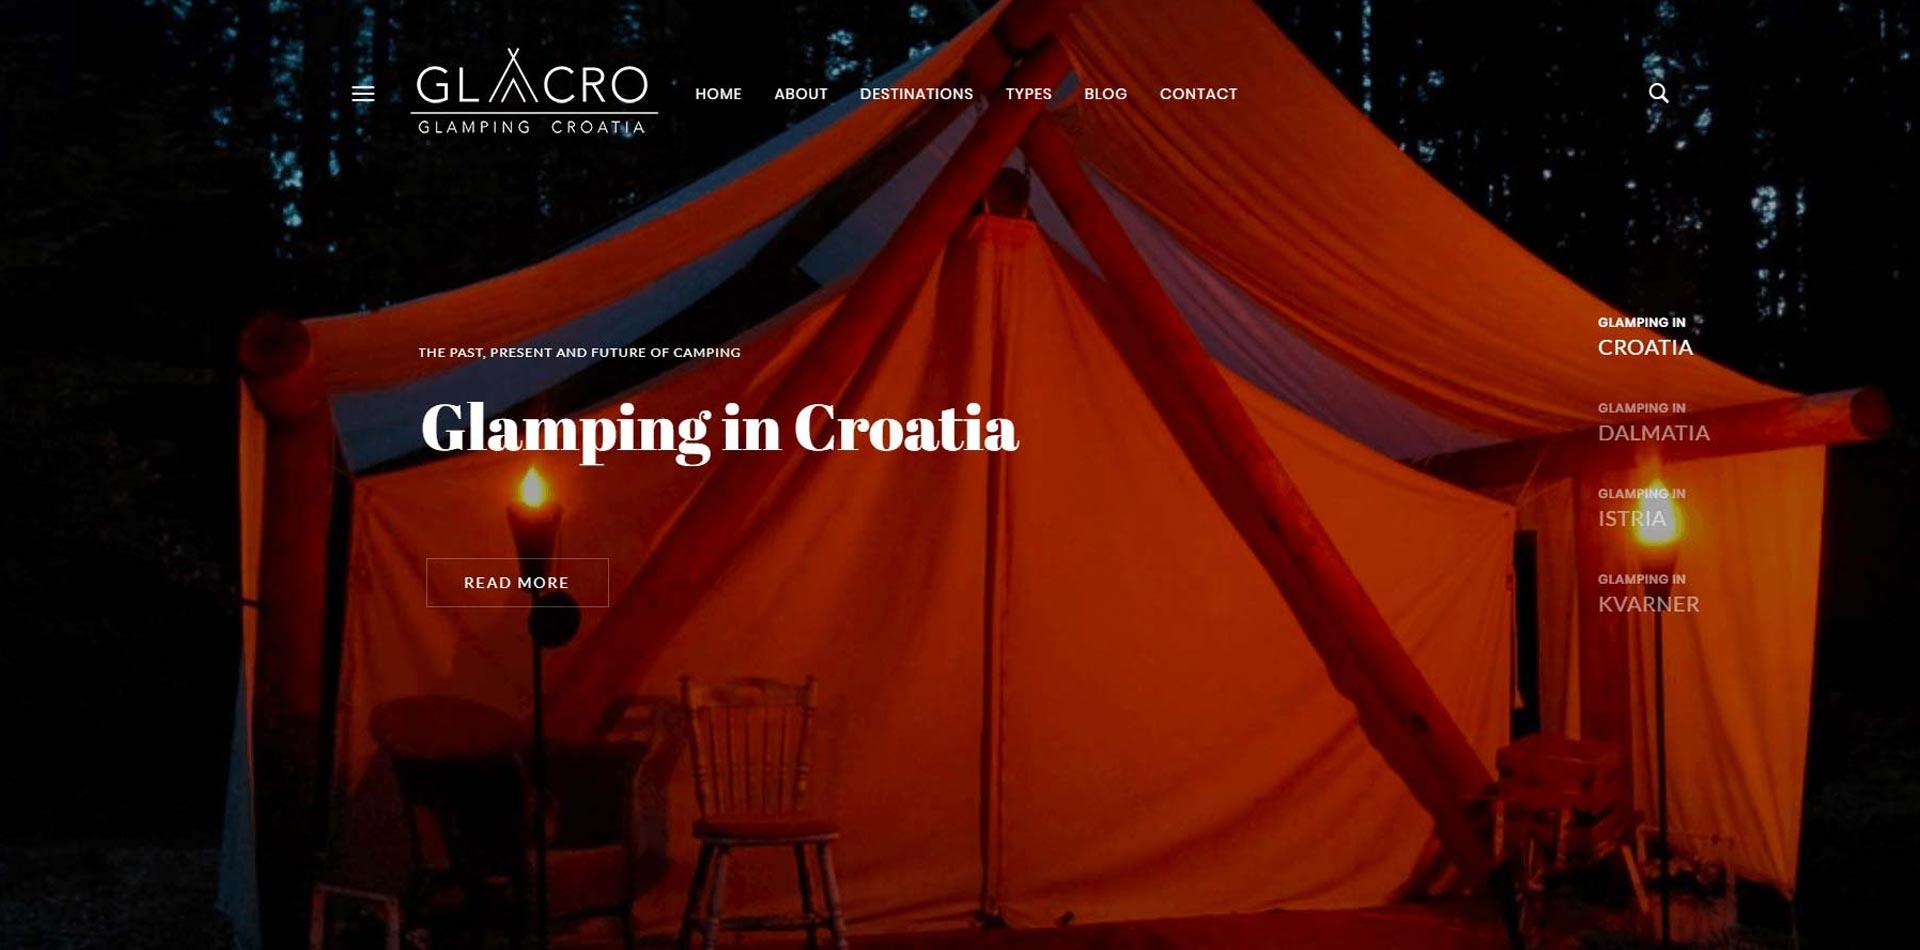 GlaCro - https://www.glacro.com/